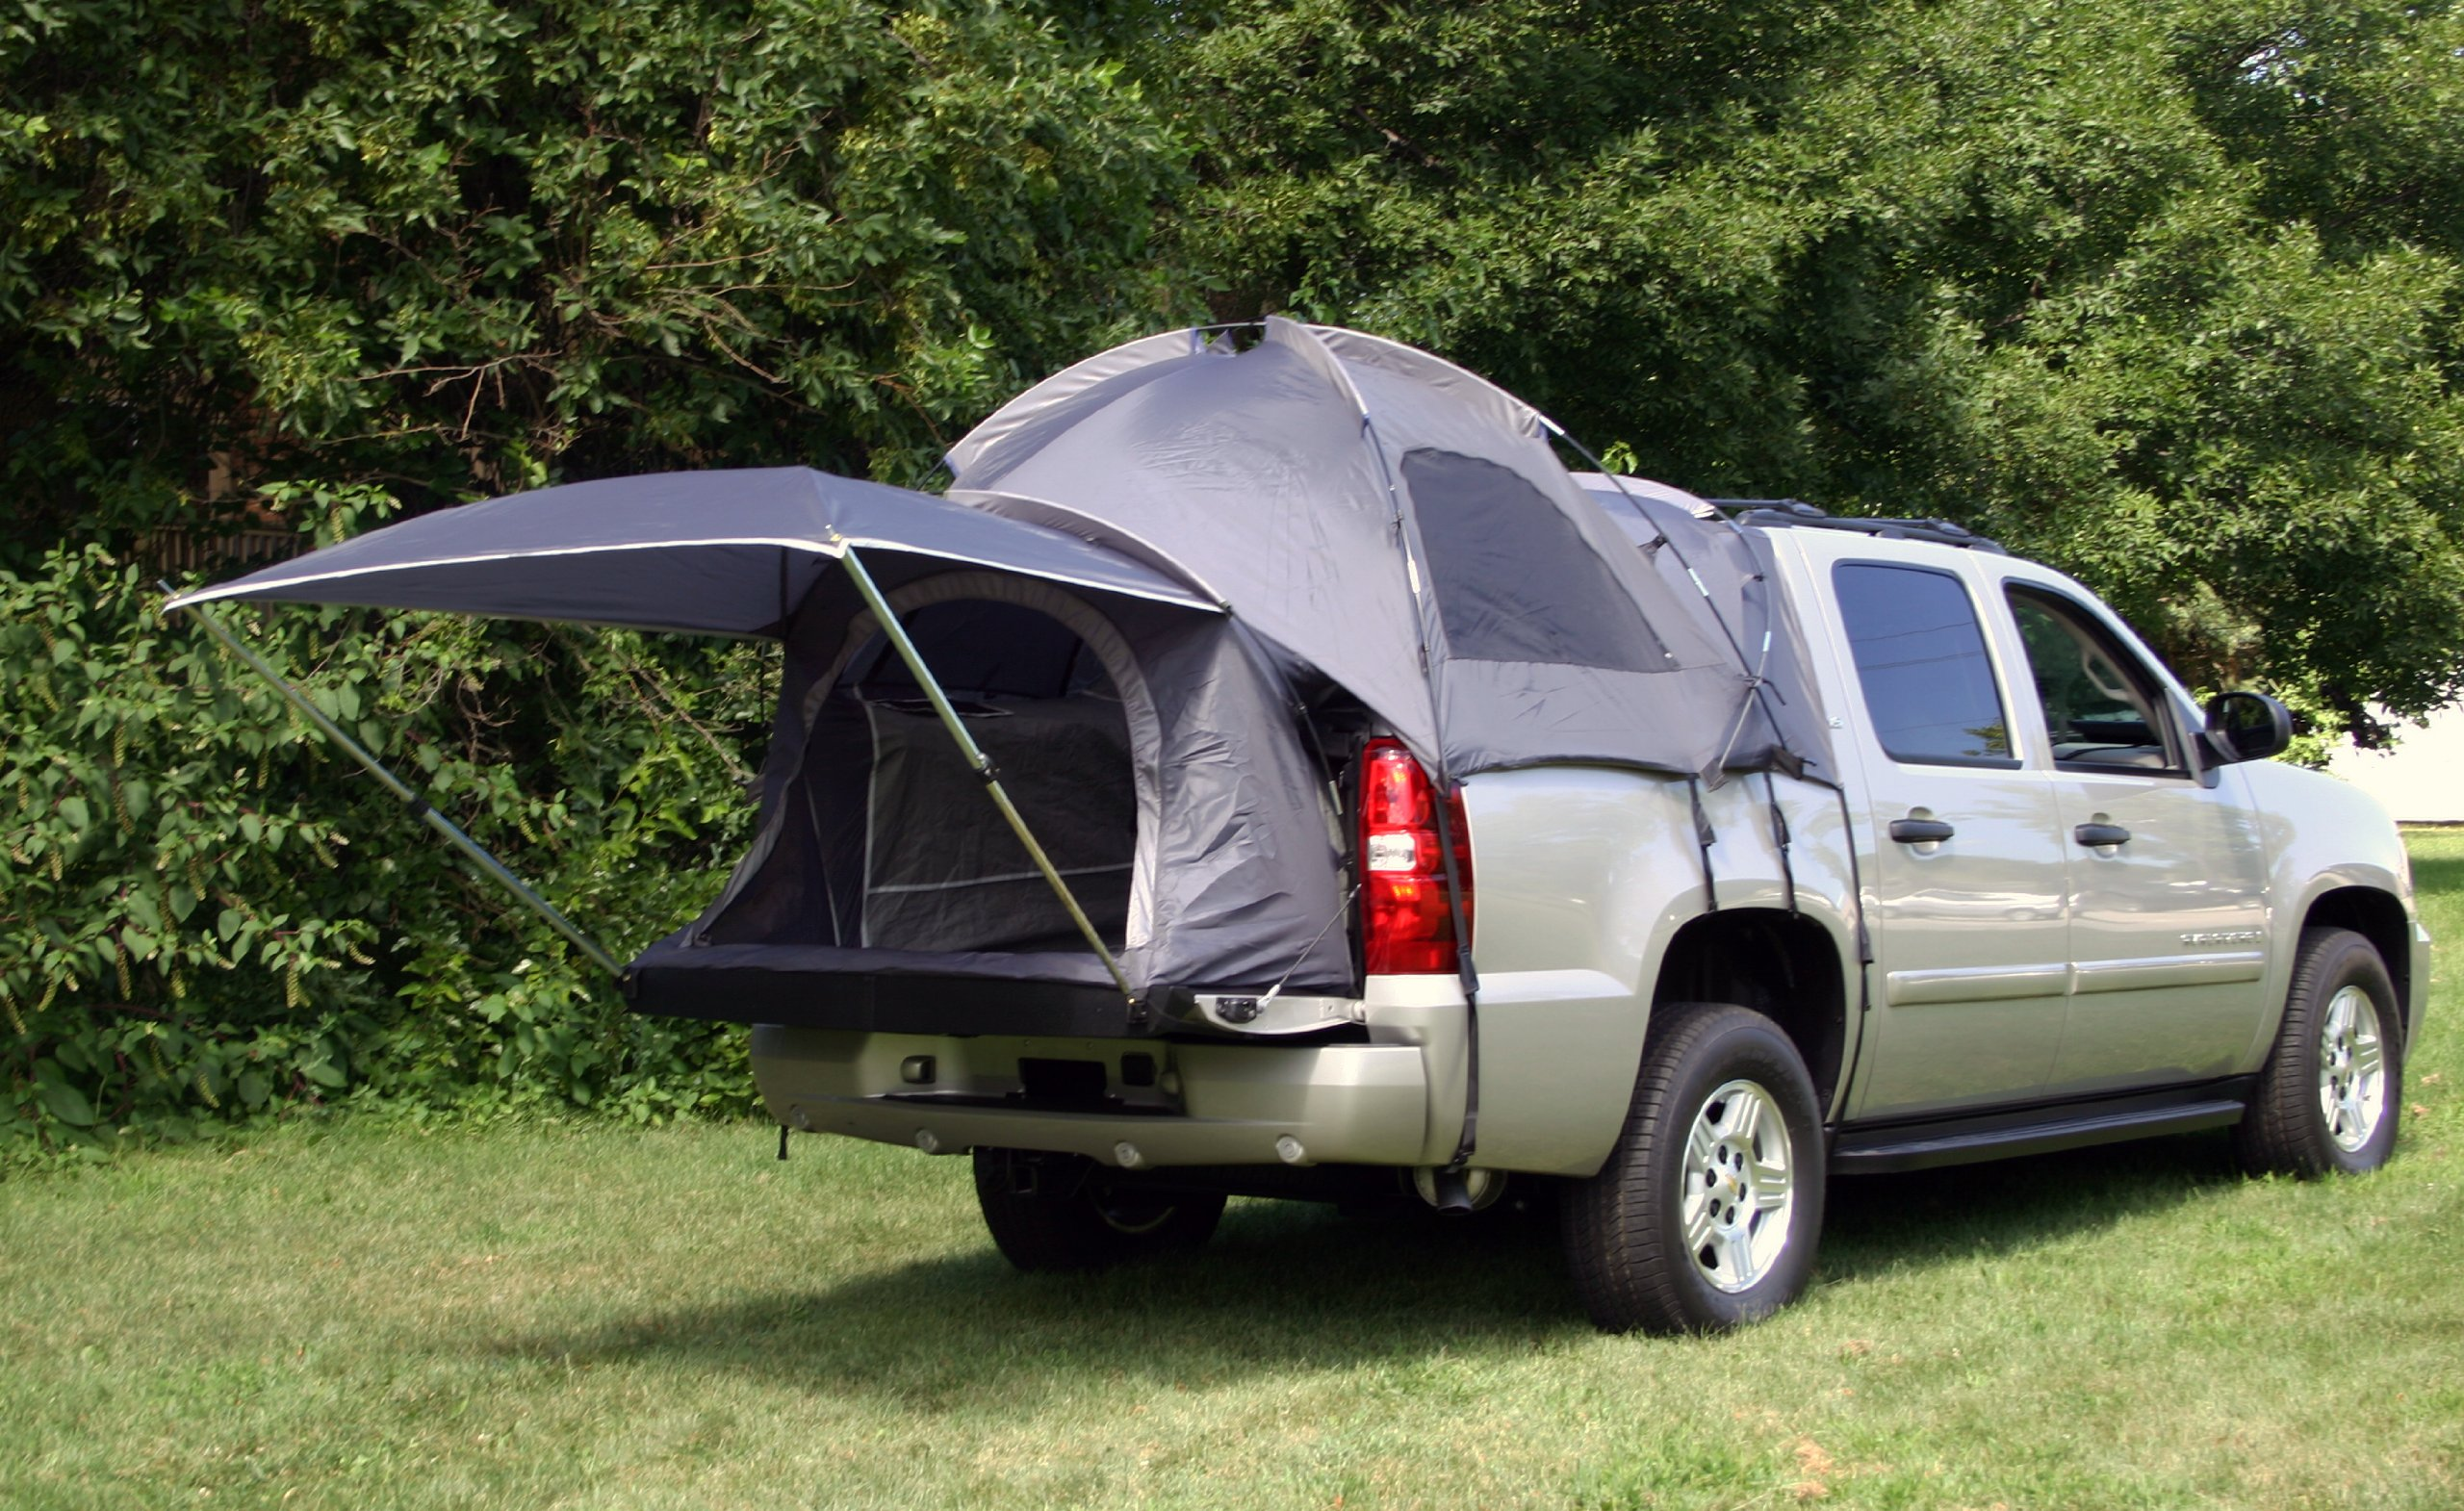 64285d24e8e Amazon.com : Sportz Avalanche Truck Tent III : Sports & Outdoors